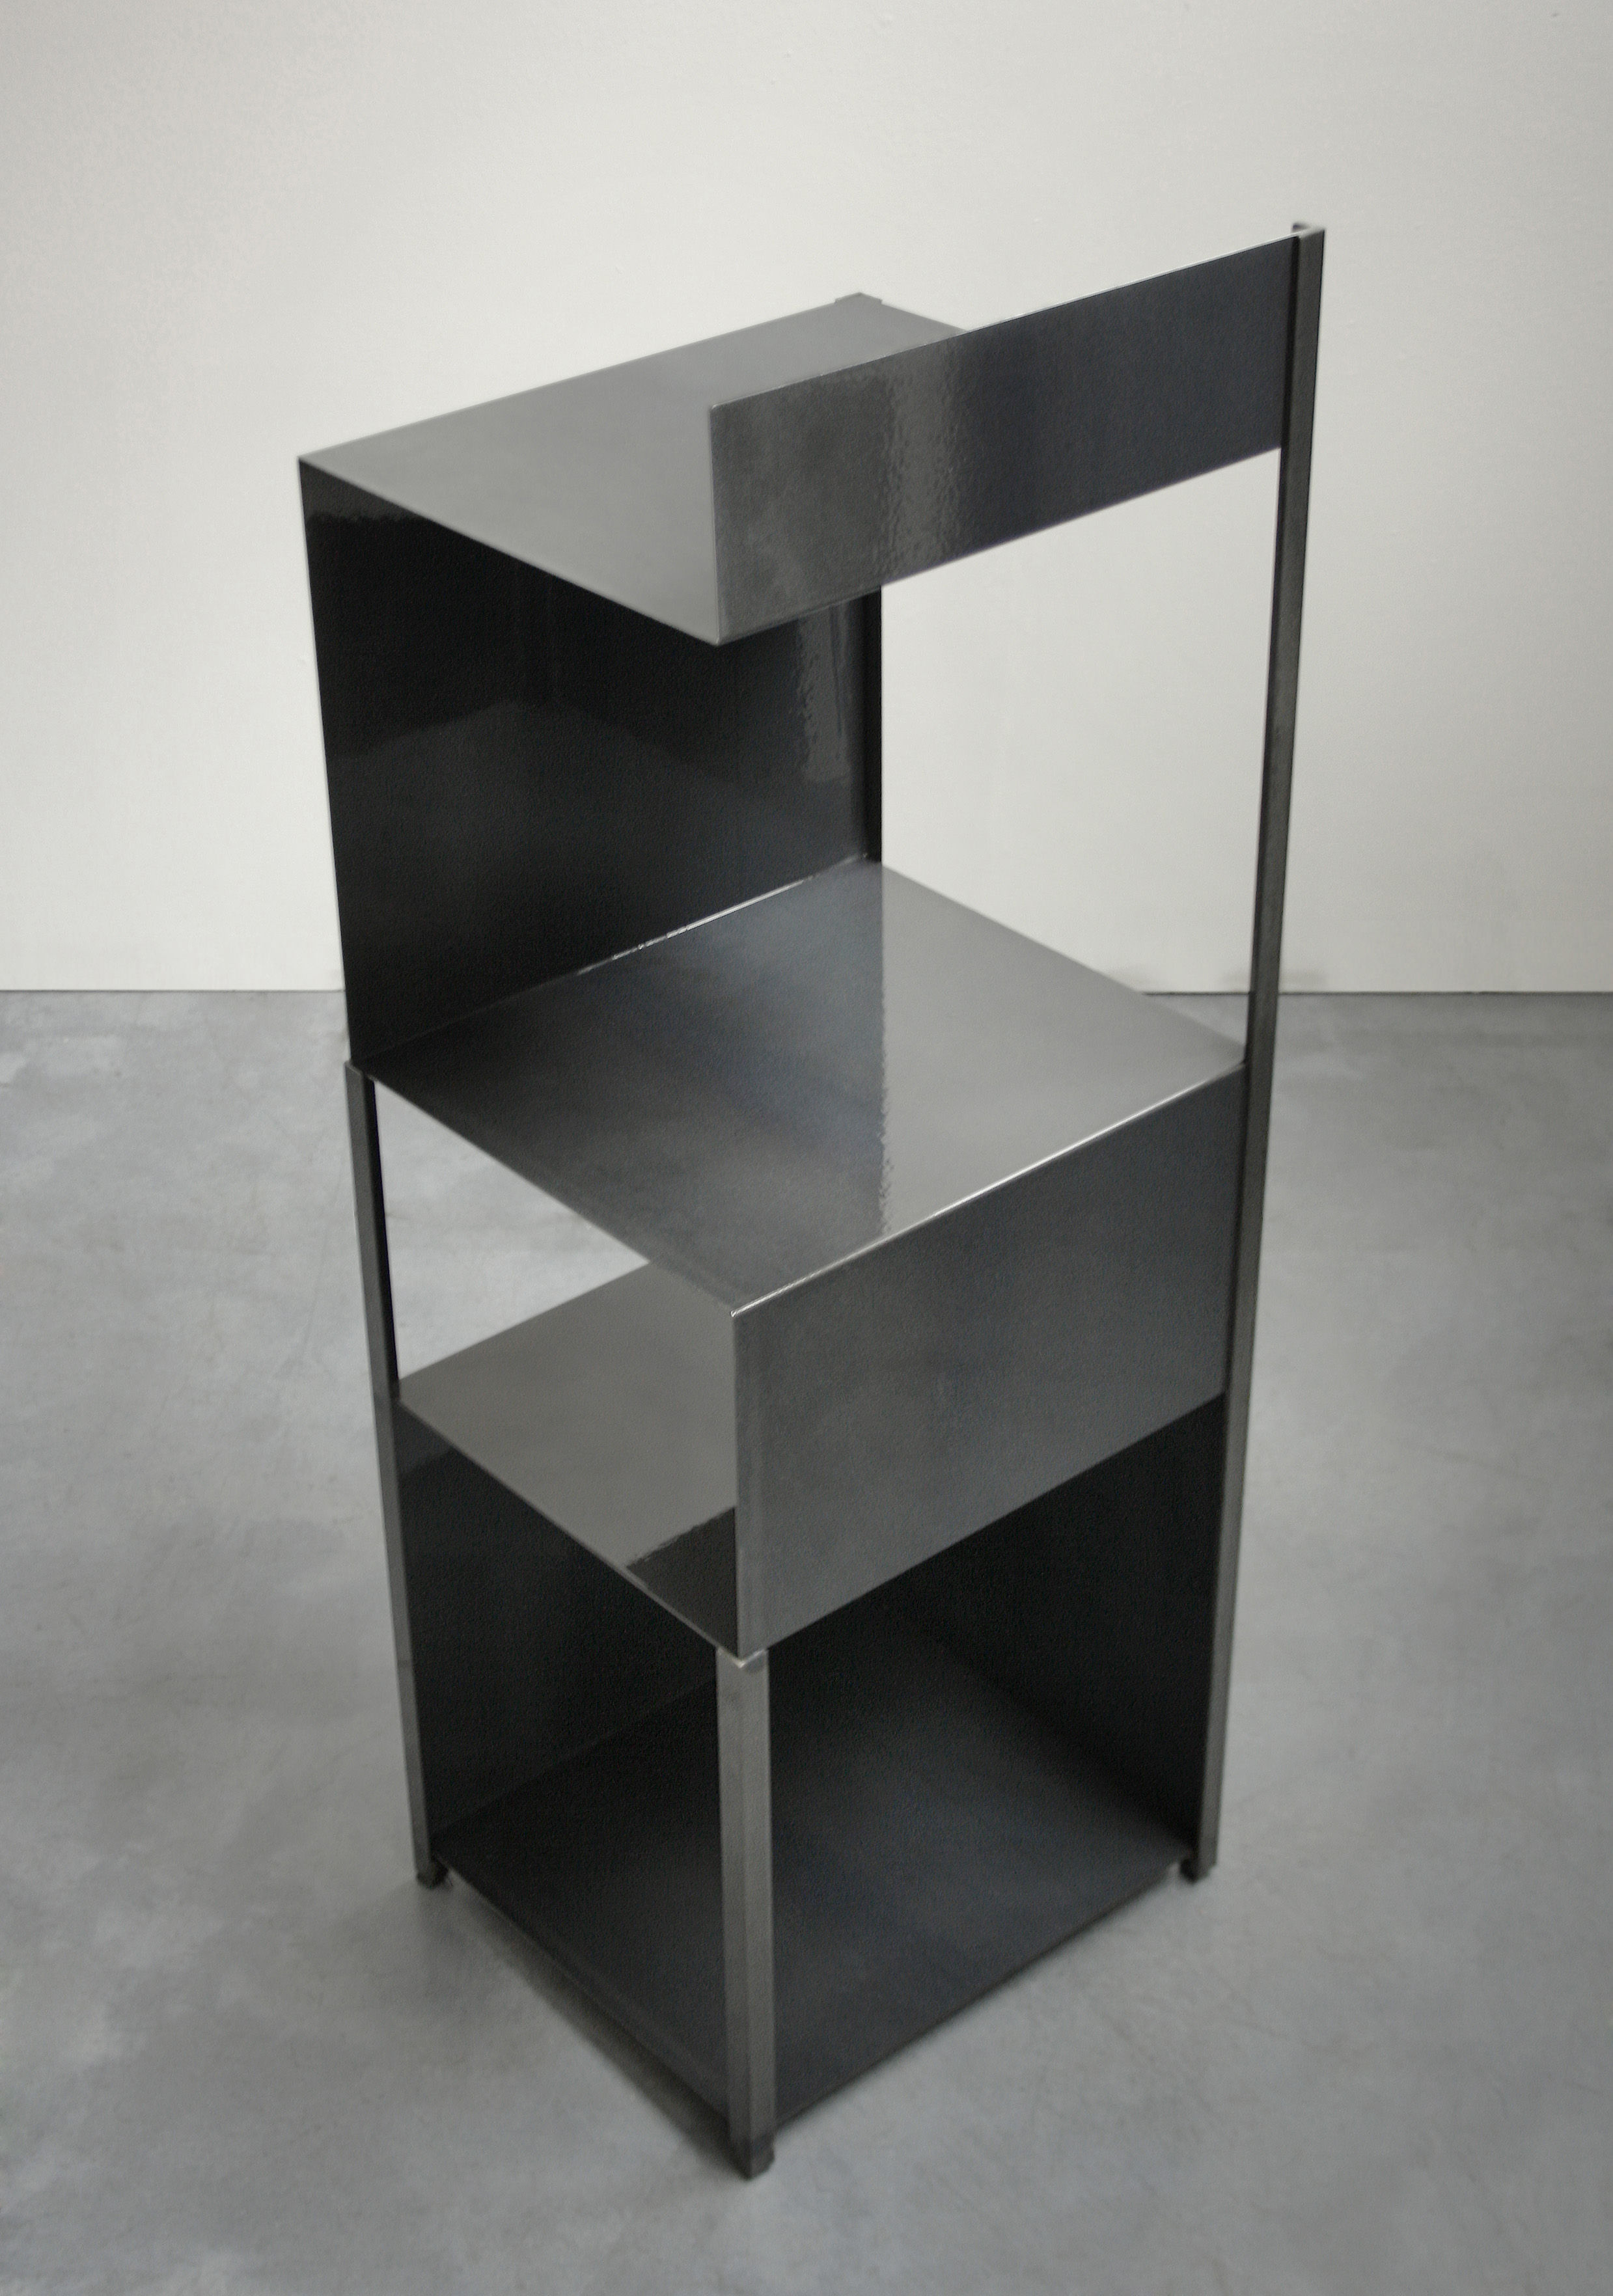 etag re tito h 110 cm blanc zeus. Black Bedroom Furniture Sets. Home Design Ideas